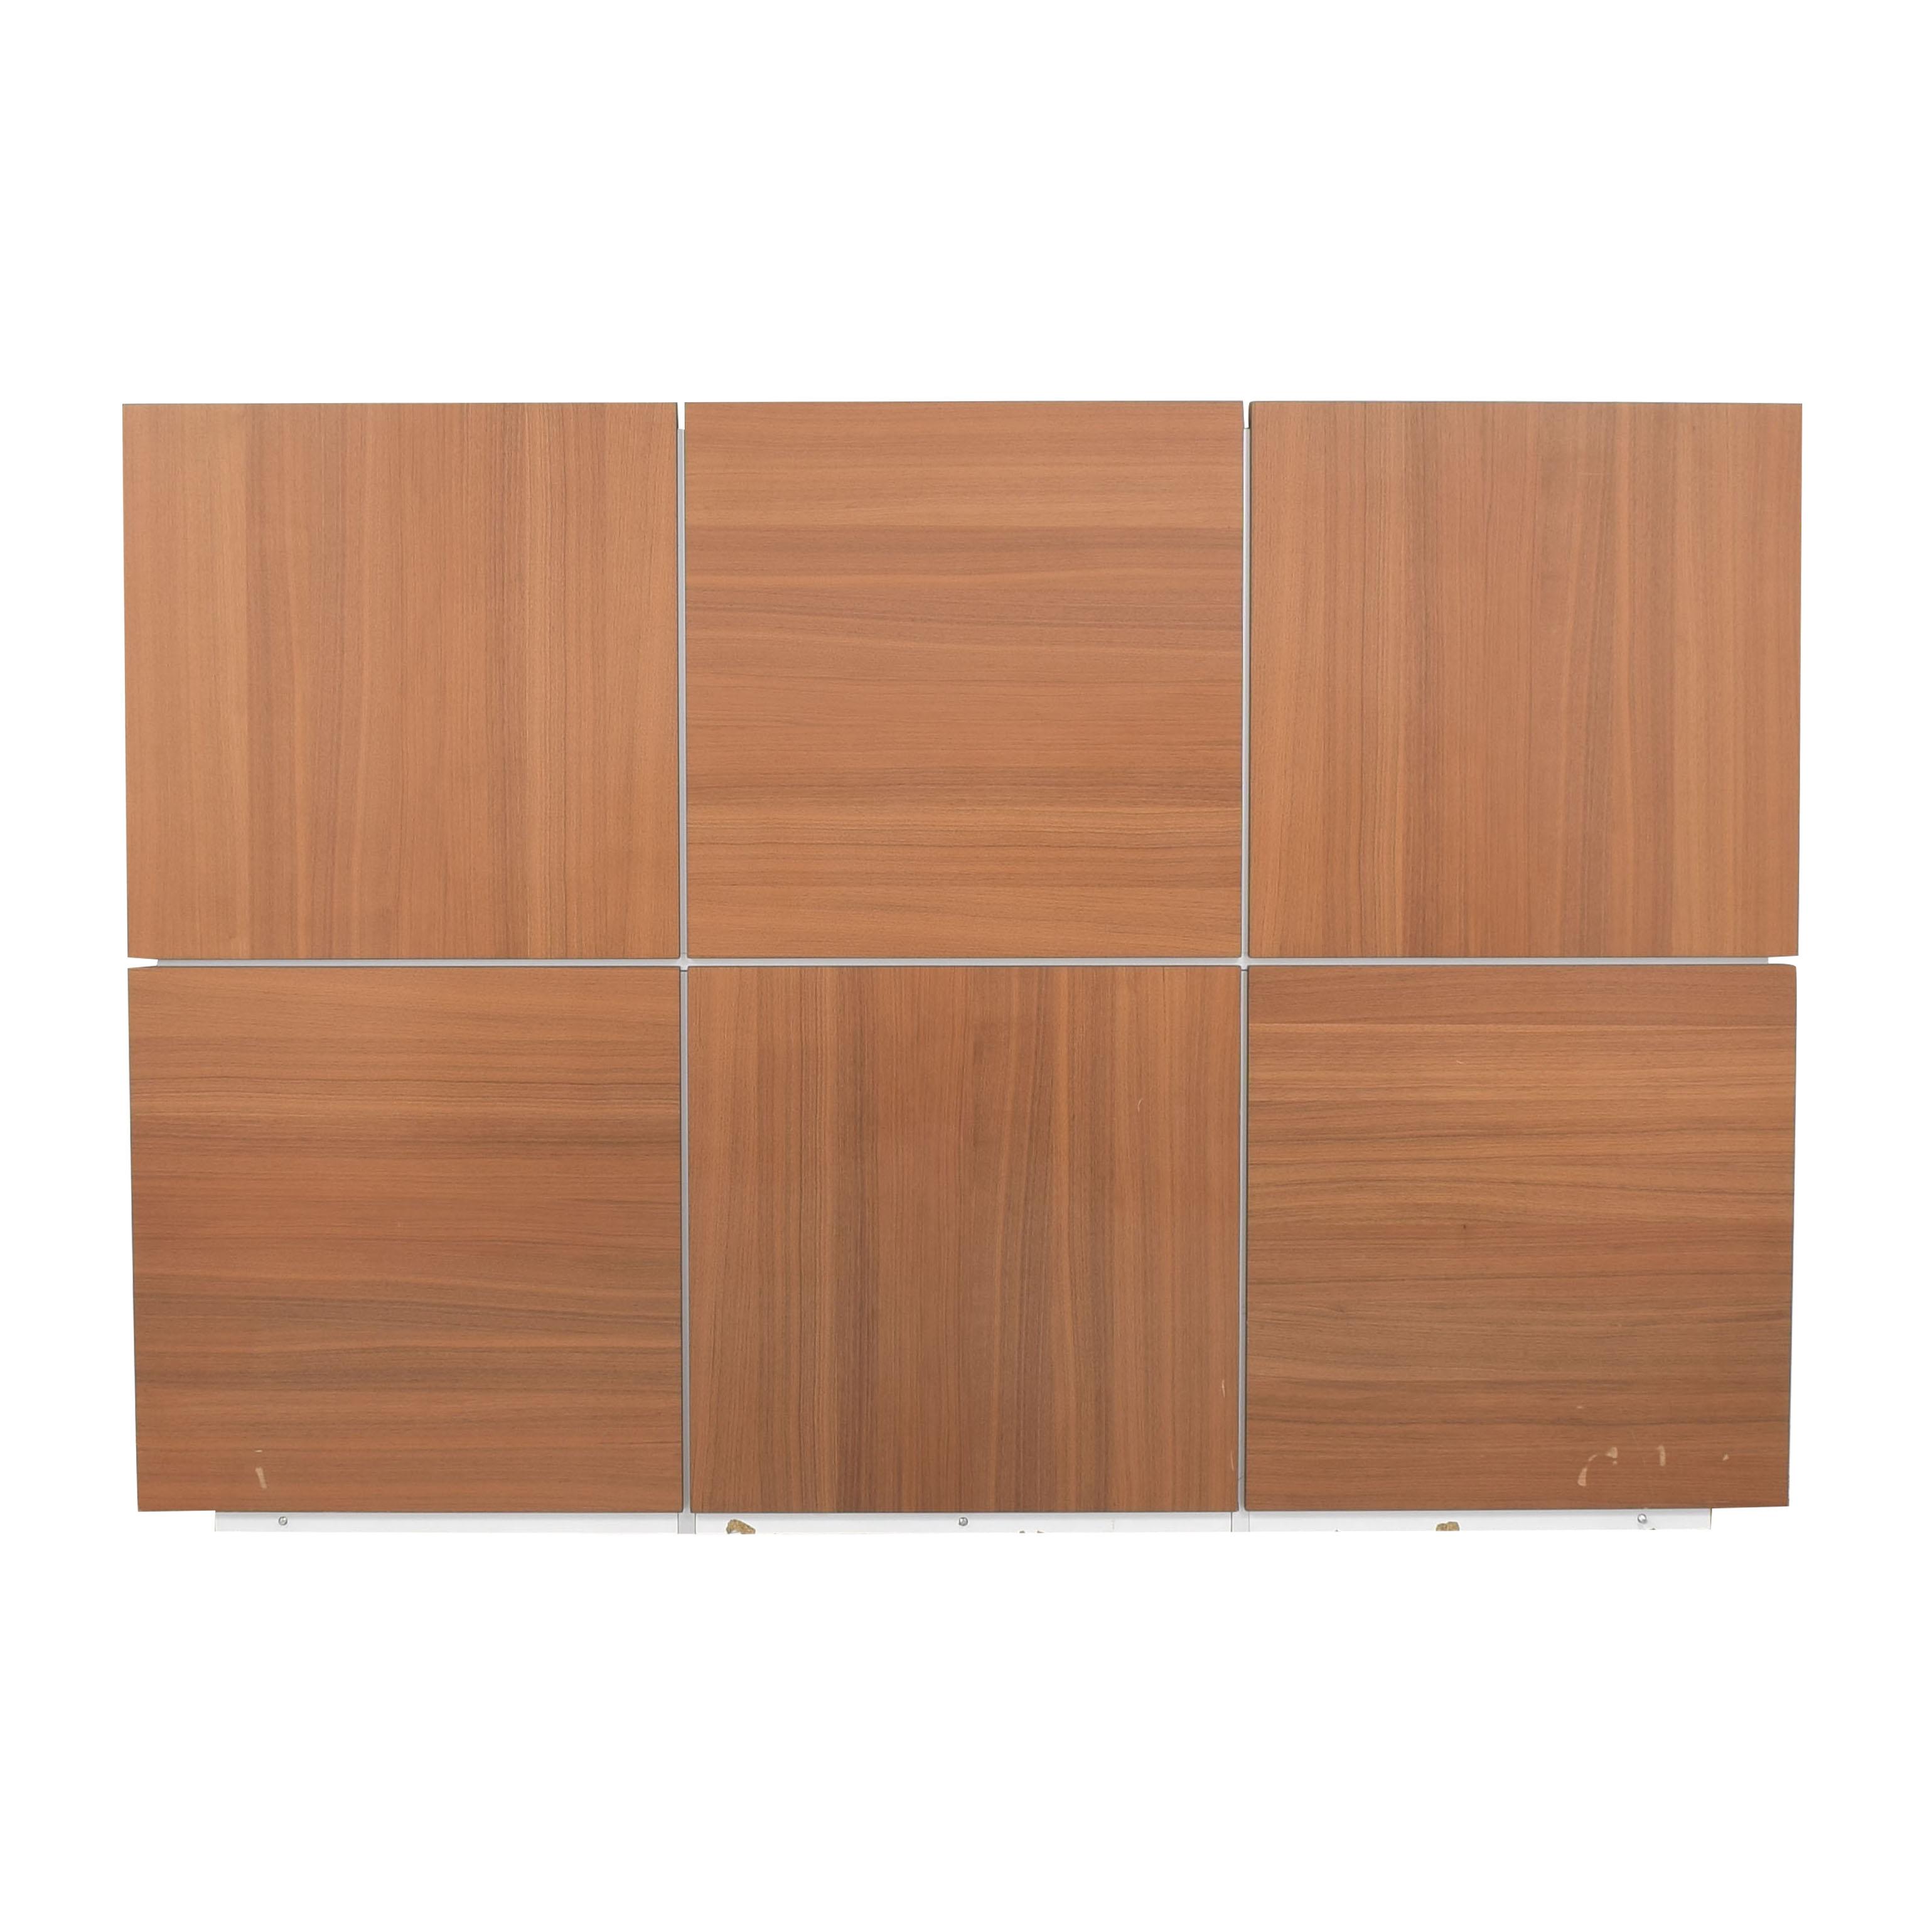 Ligne Roset Peter Maly King Lumeo Headboard / Sofa Beds